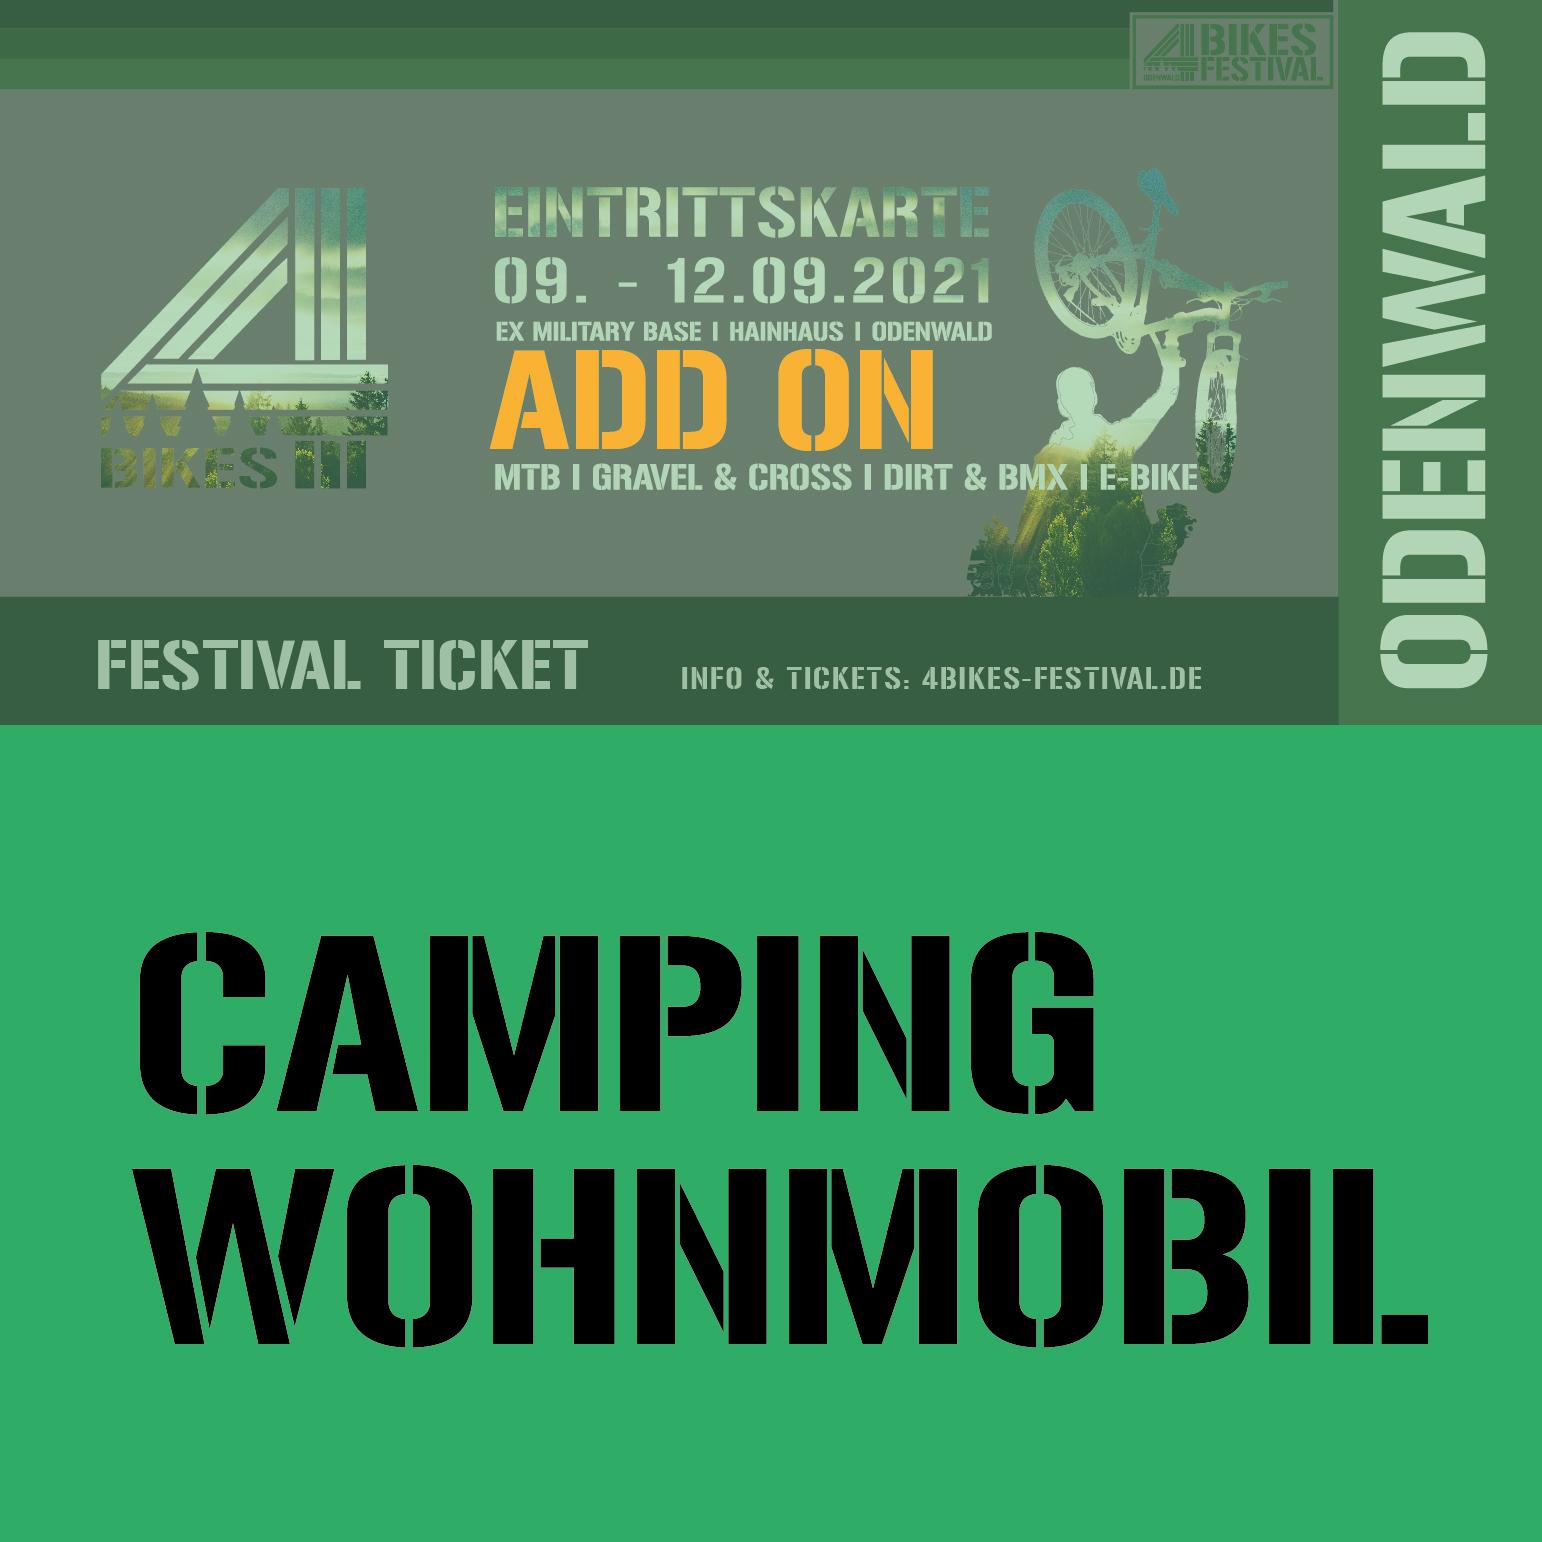 20SHOP_TICKET_WOHNMOBIL_CAMP_